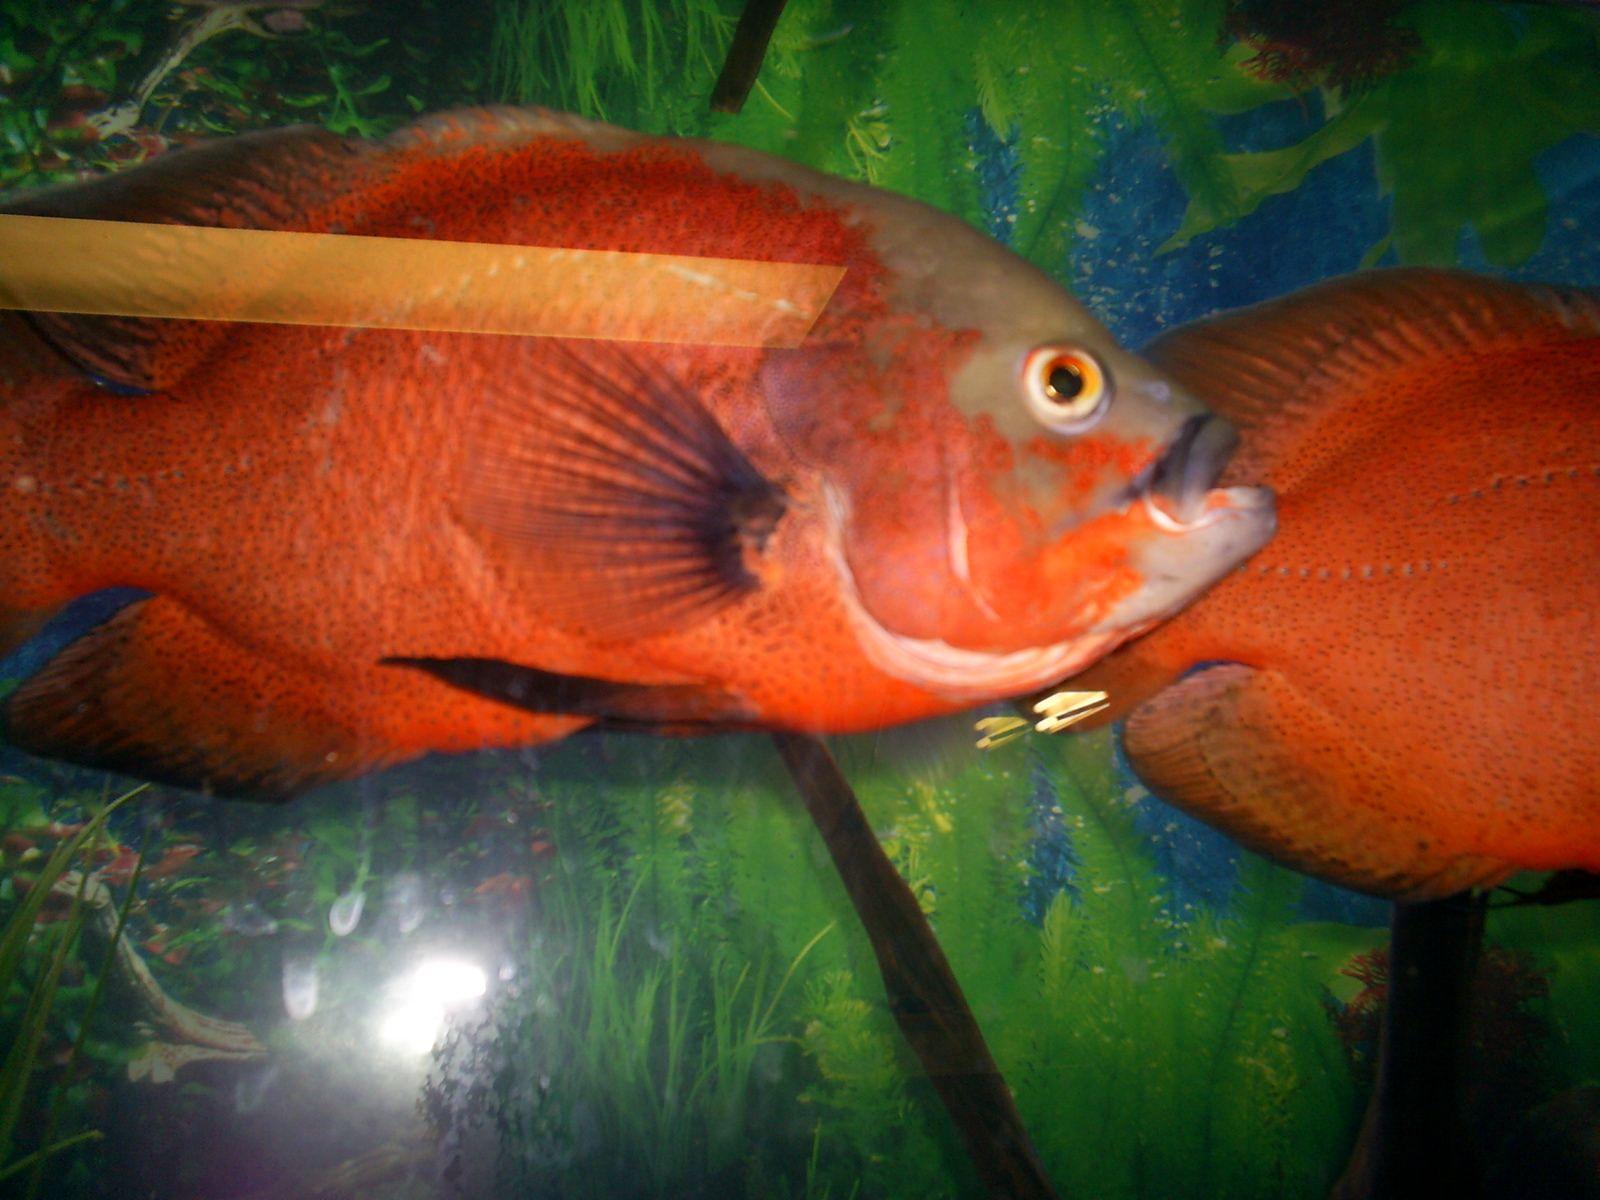 Red oscars | My fish tank | Pinterest | Fish tanks